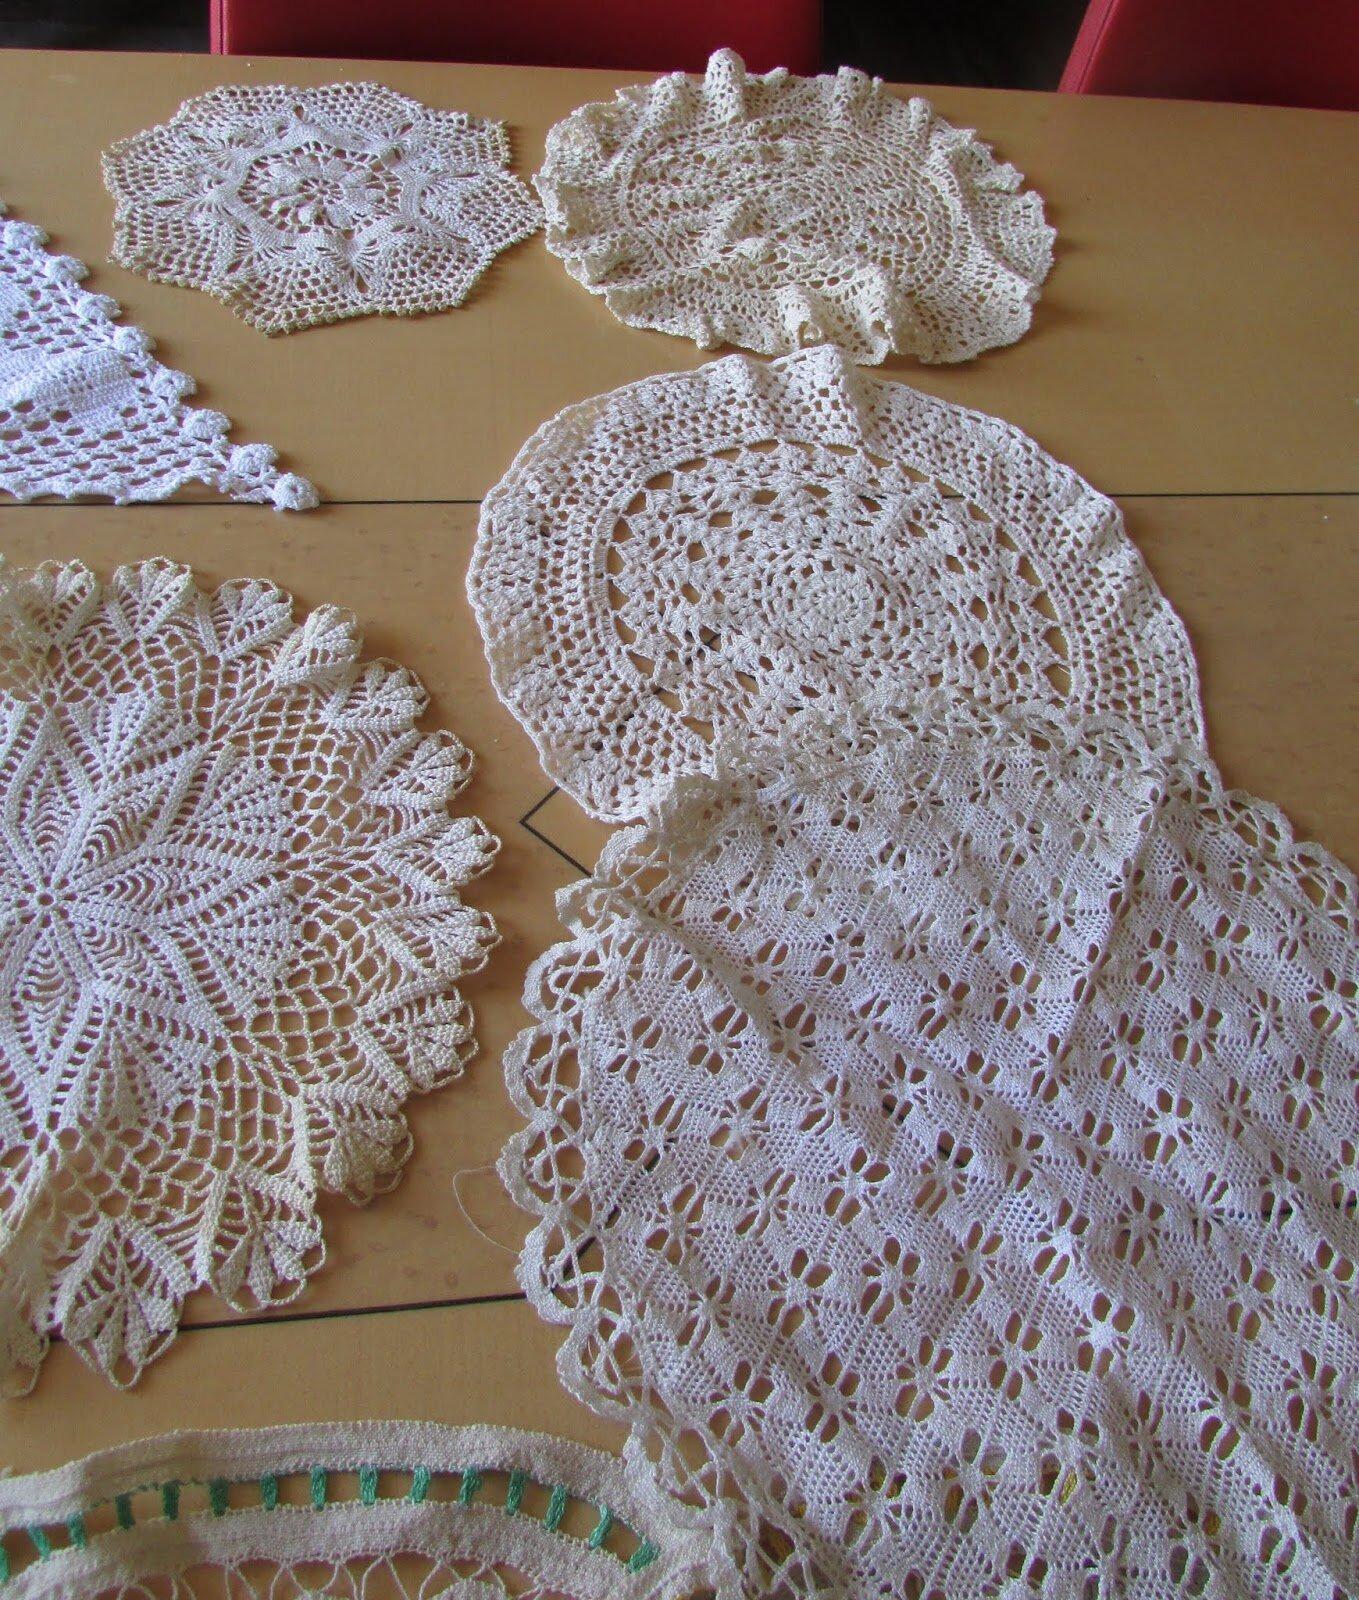 Napperon en crochet main lot de 13 napperons dentelles chantale poucel a montmorillon 86 - Napperon dentelle crochet ...